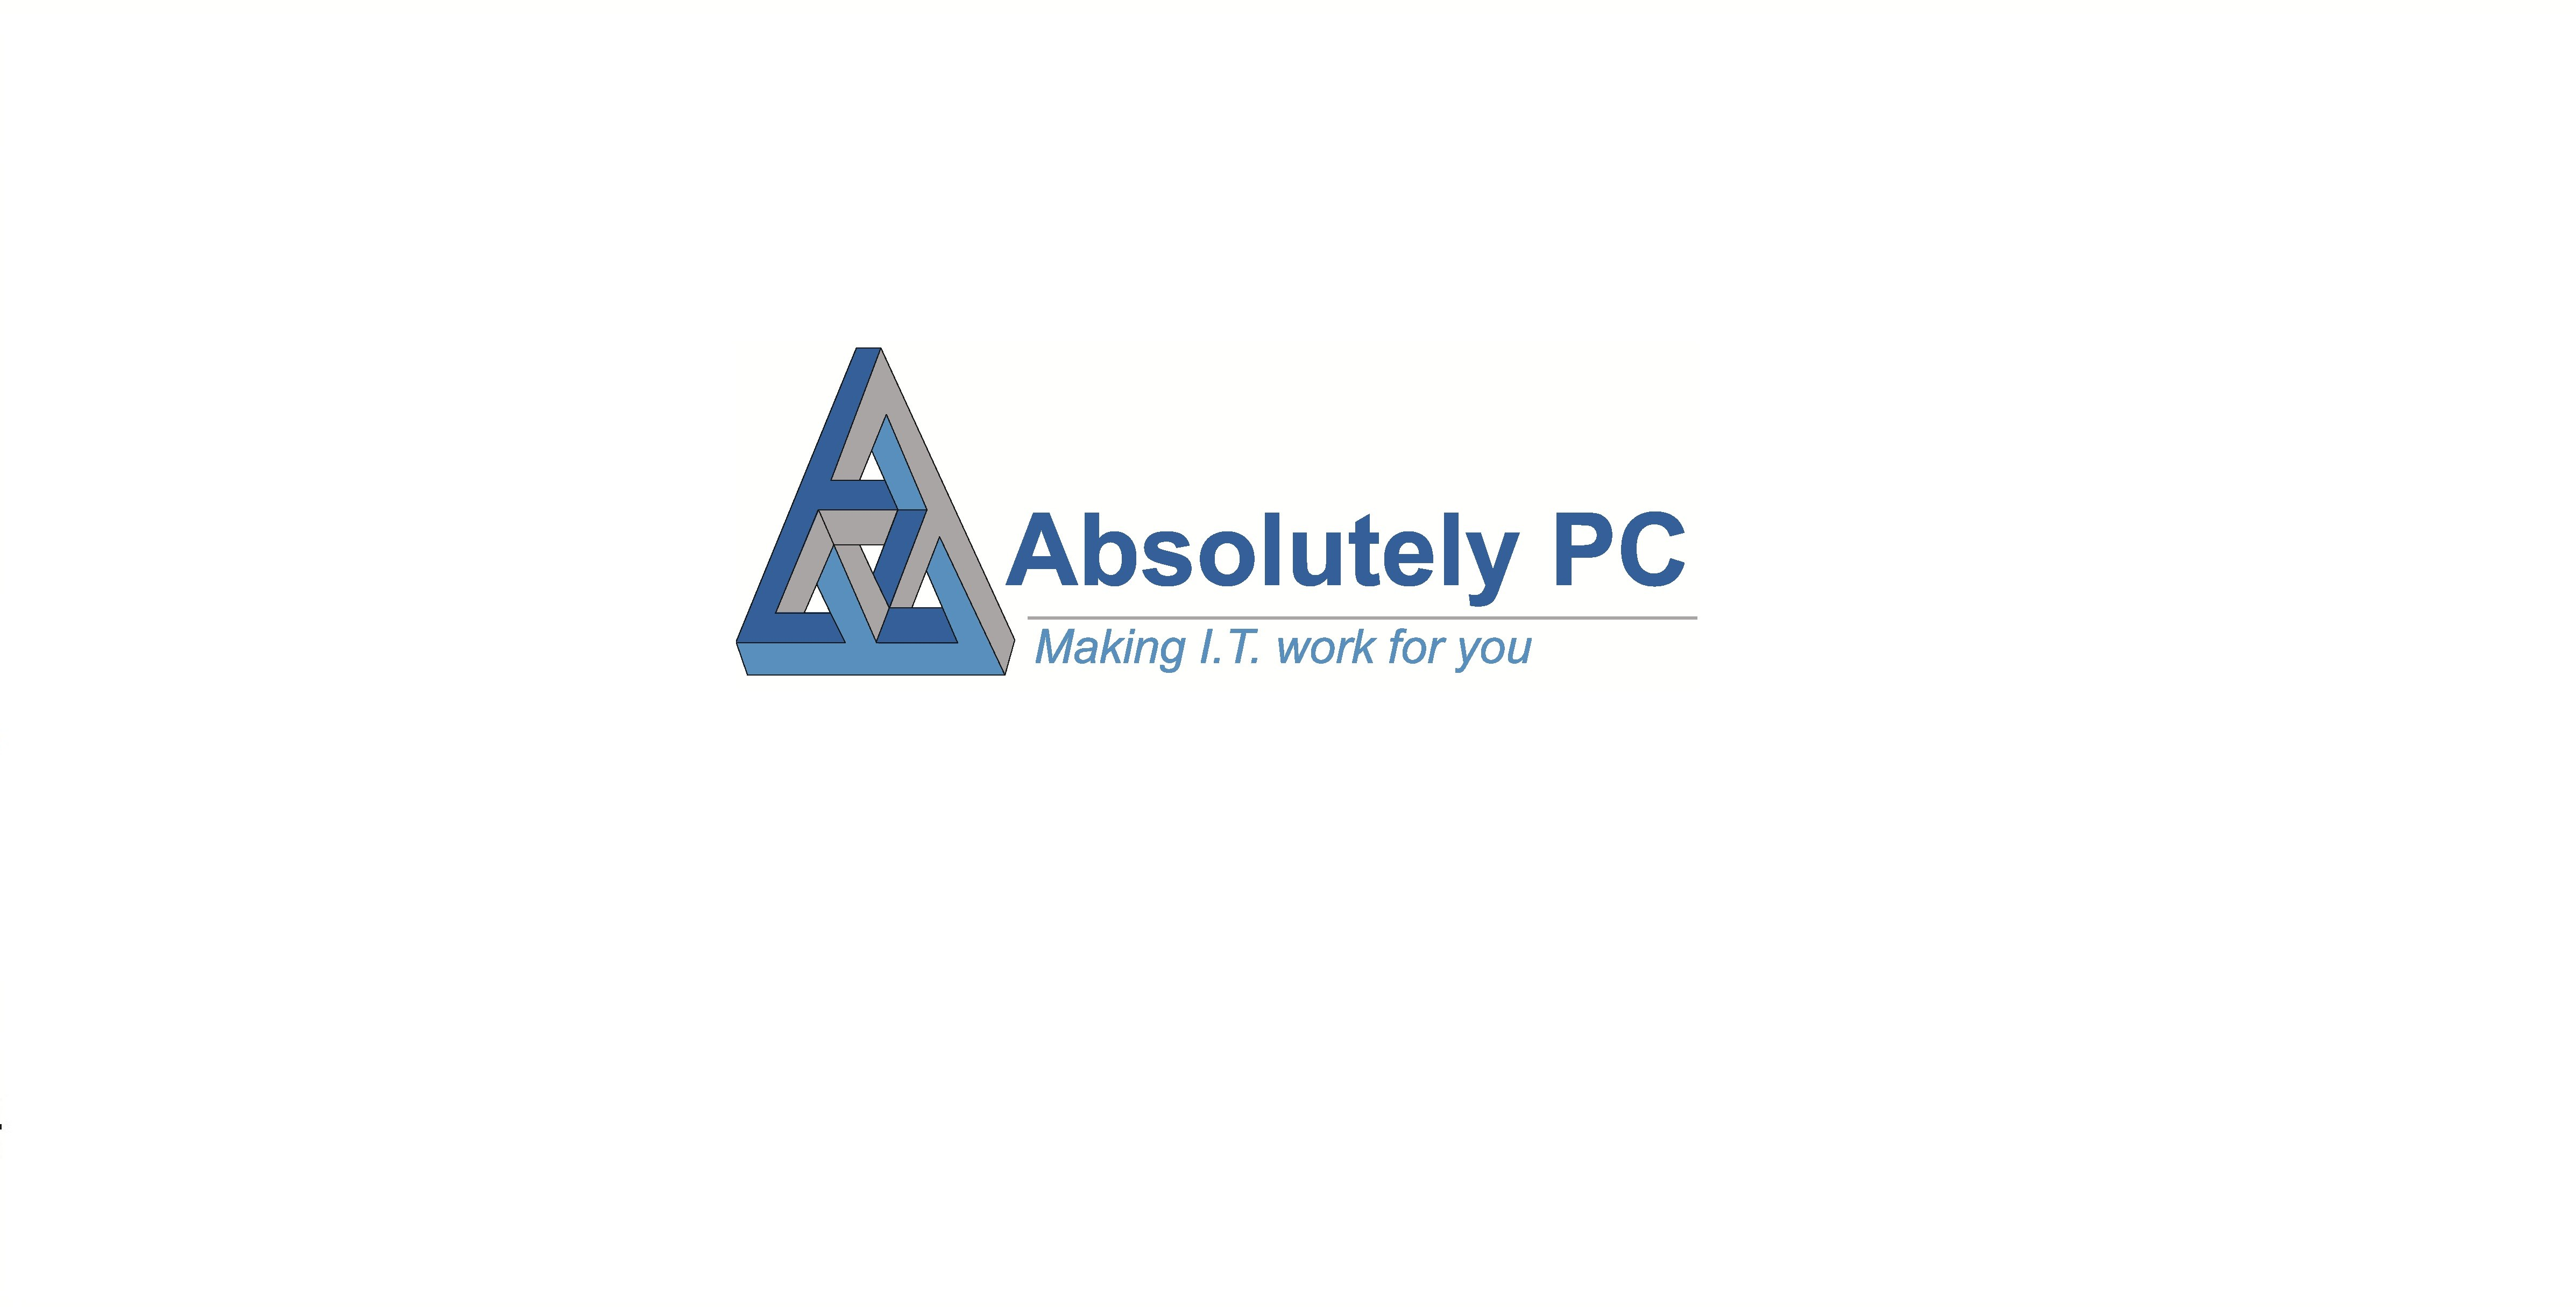 Absolutely PC Ltd | LinkedIn